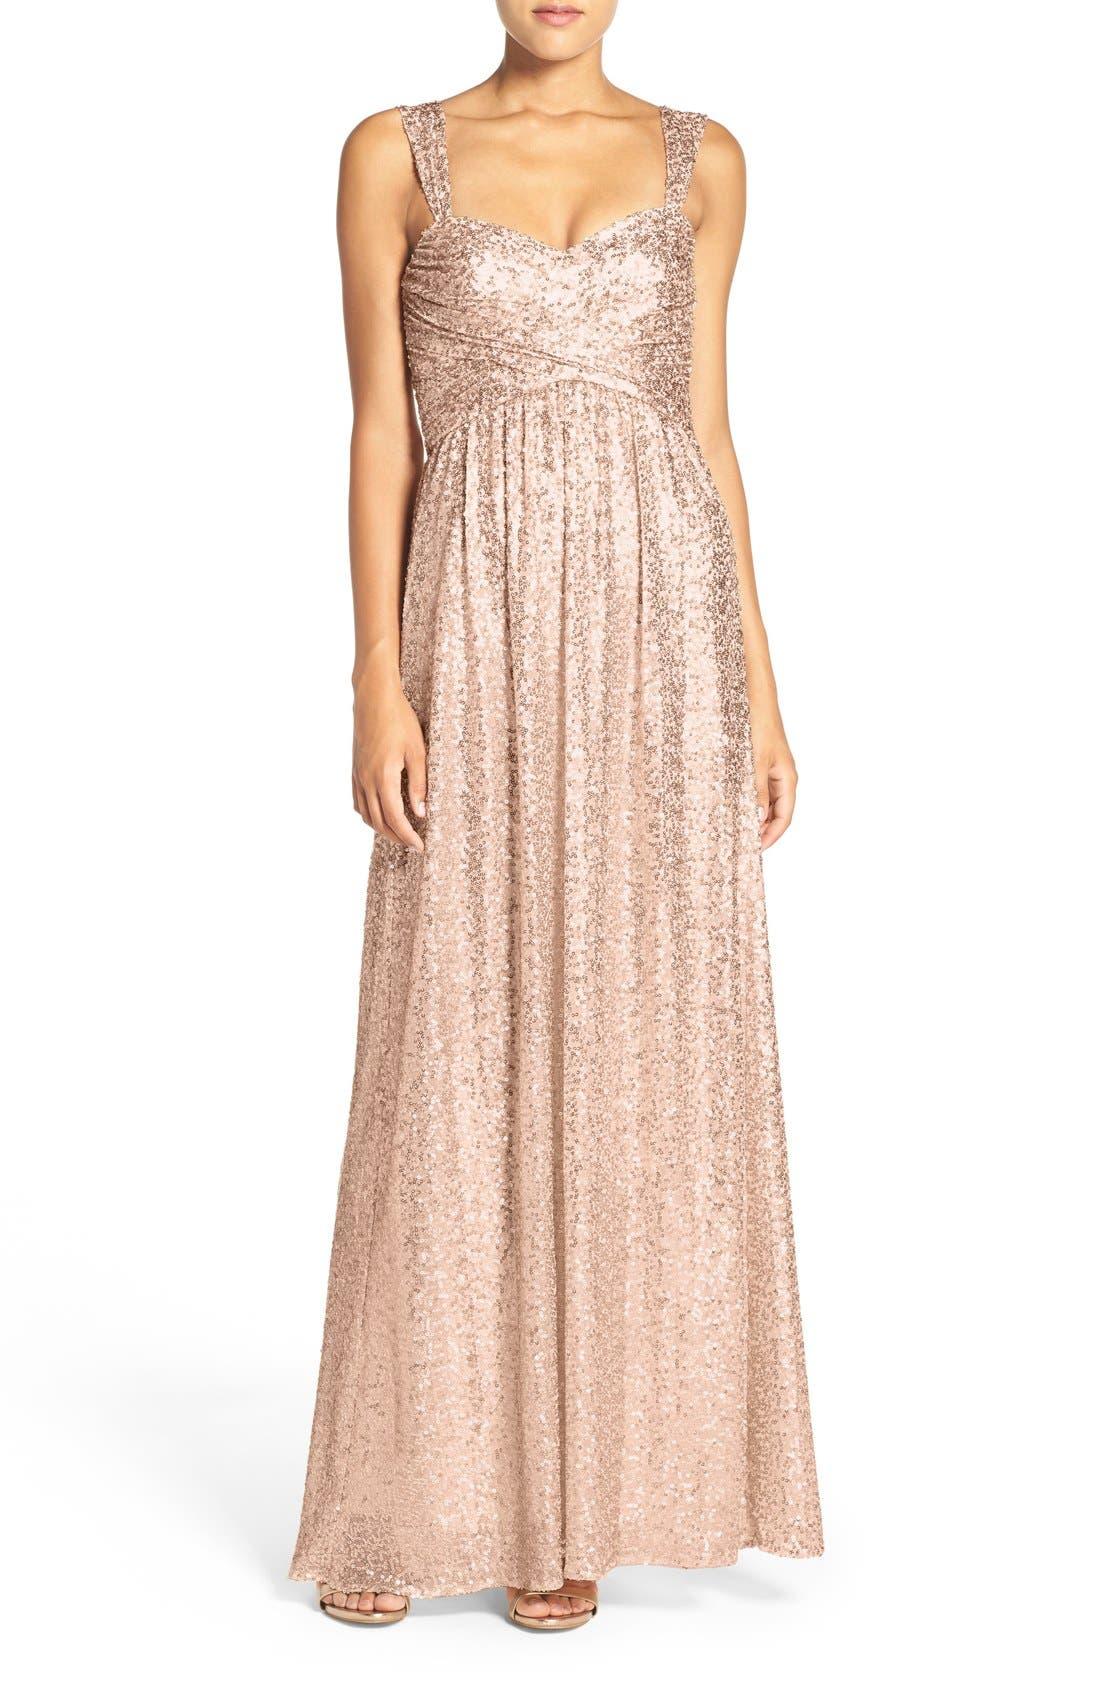 Main Image - Amsale 'Loire' Sweetheart Neck Sequin Gown